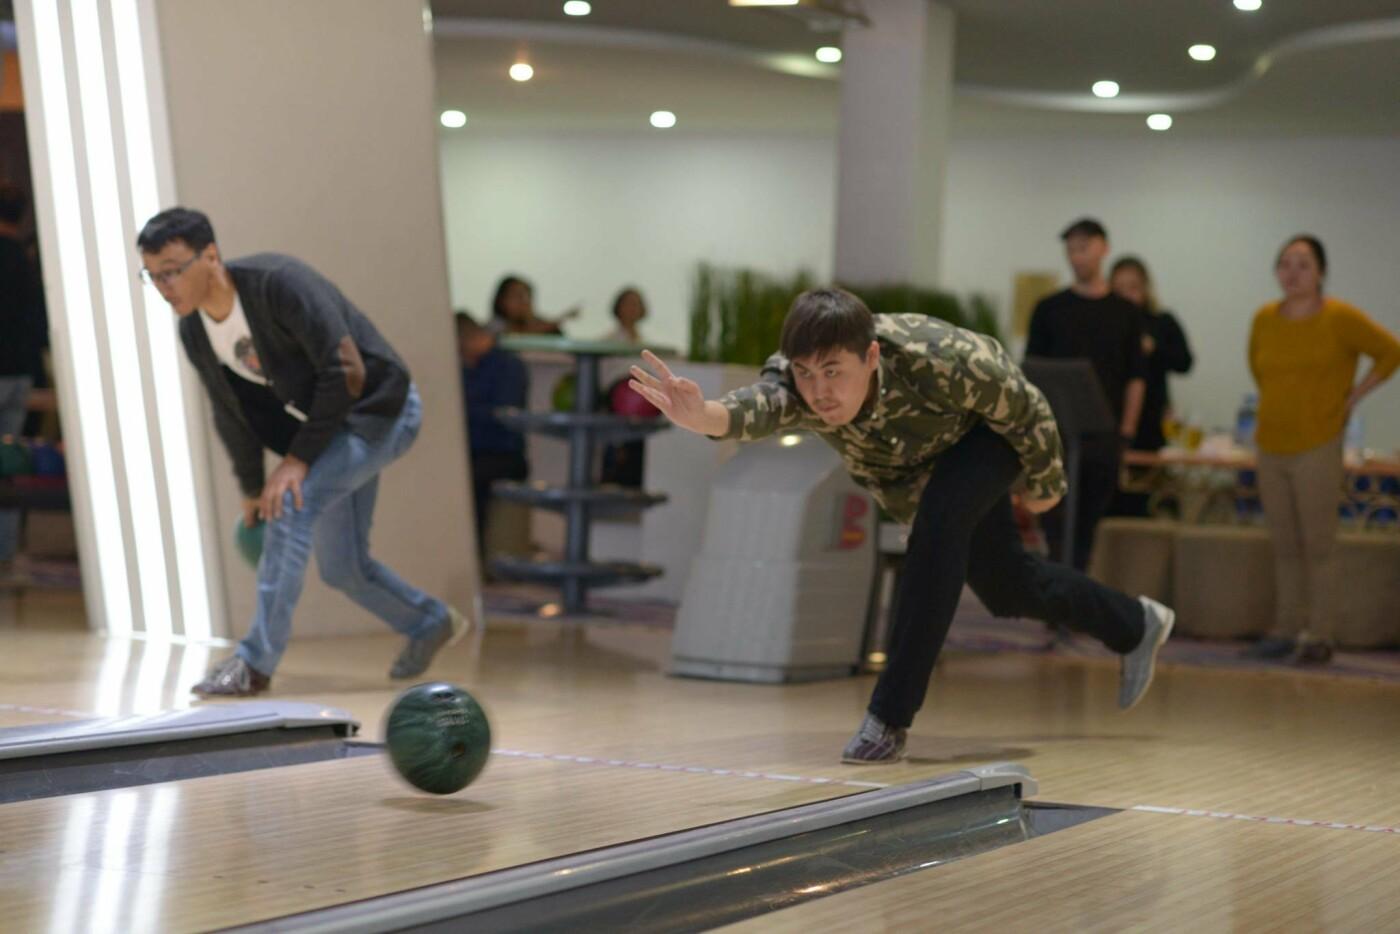 II турнир по боулингу среди журналистов прошел в Алматы (ФОТО), фото-4